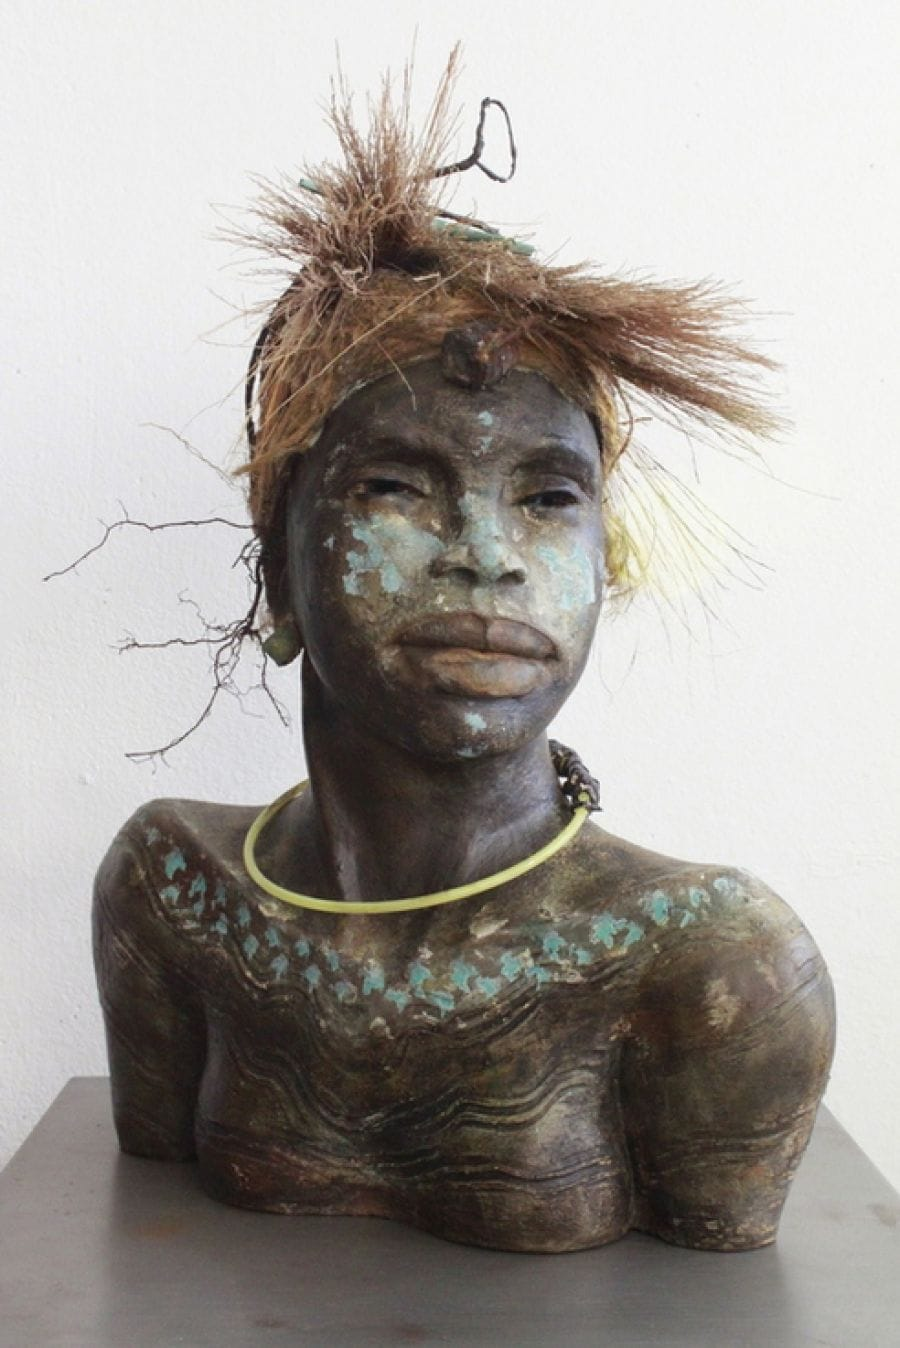 Kunst: Mwamba – Krachtig van kunstenaar Lilian Wessels